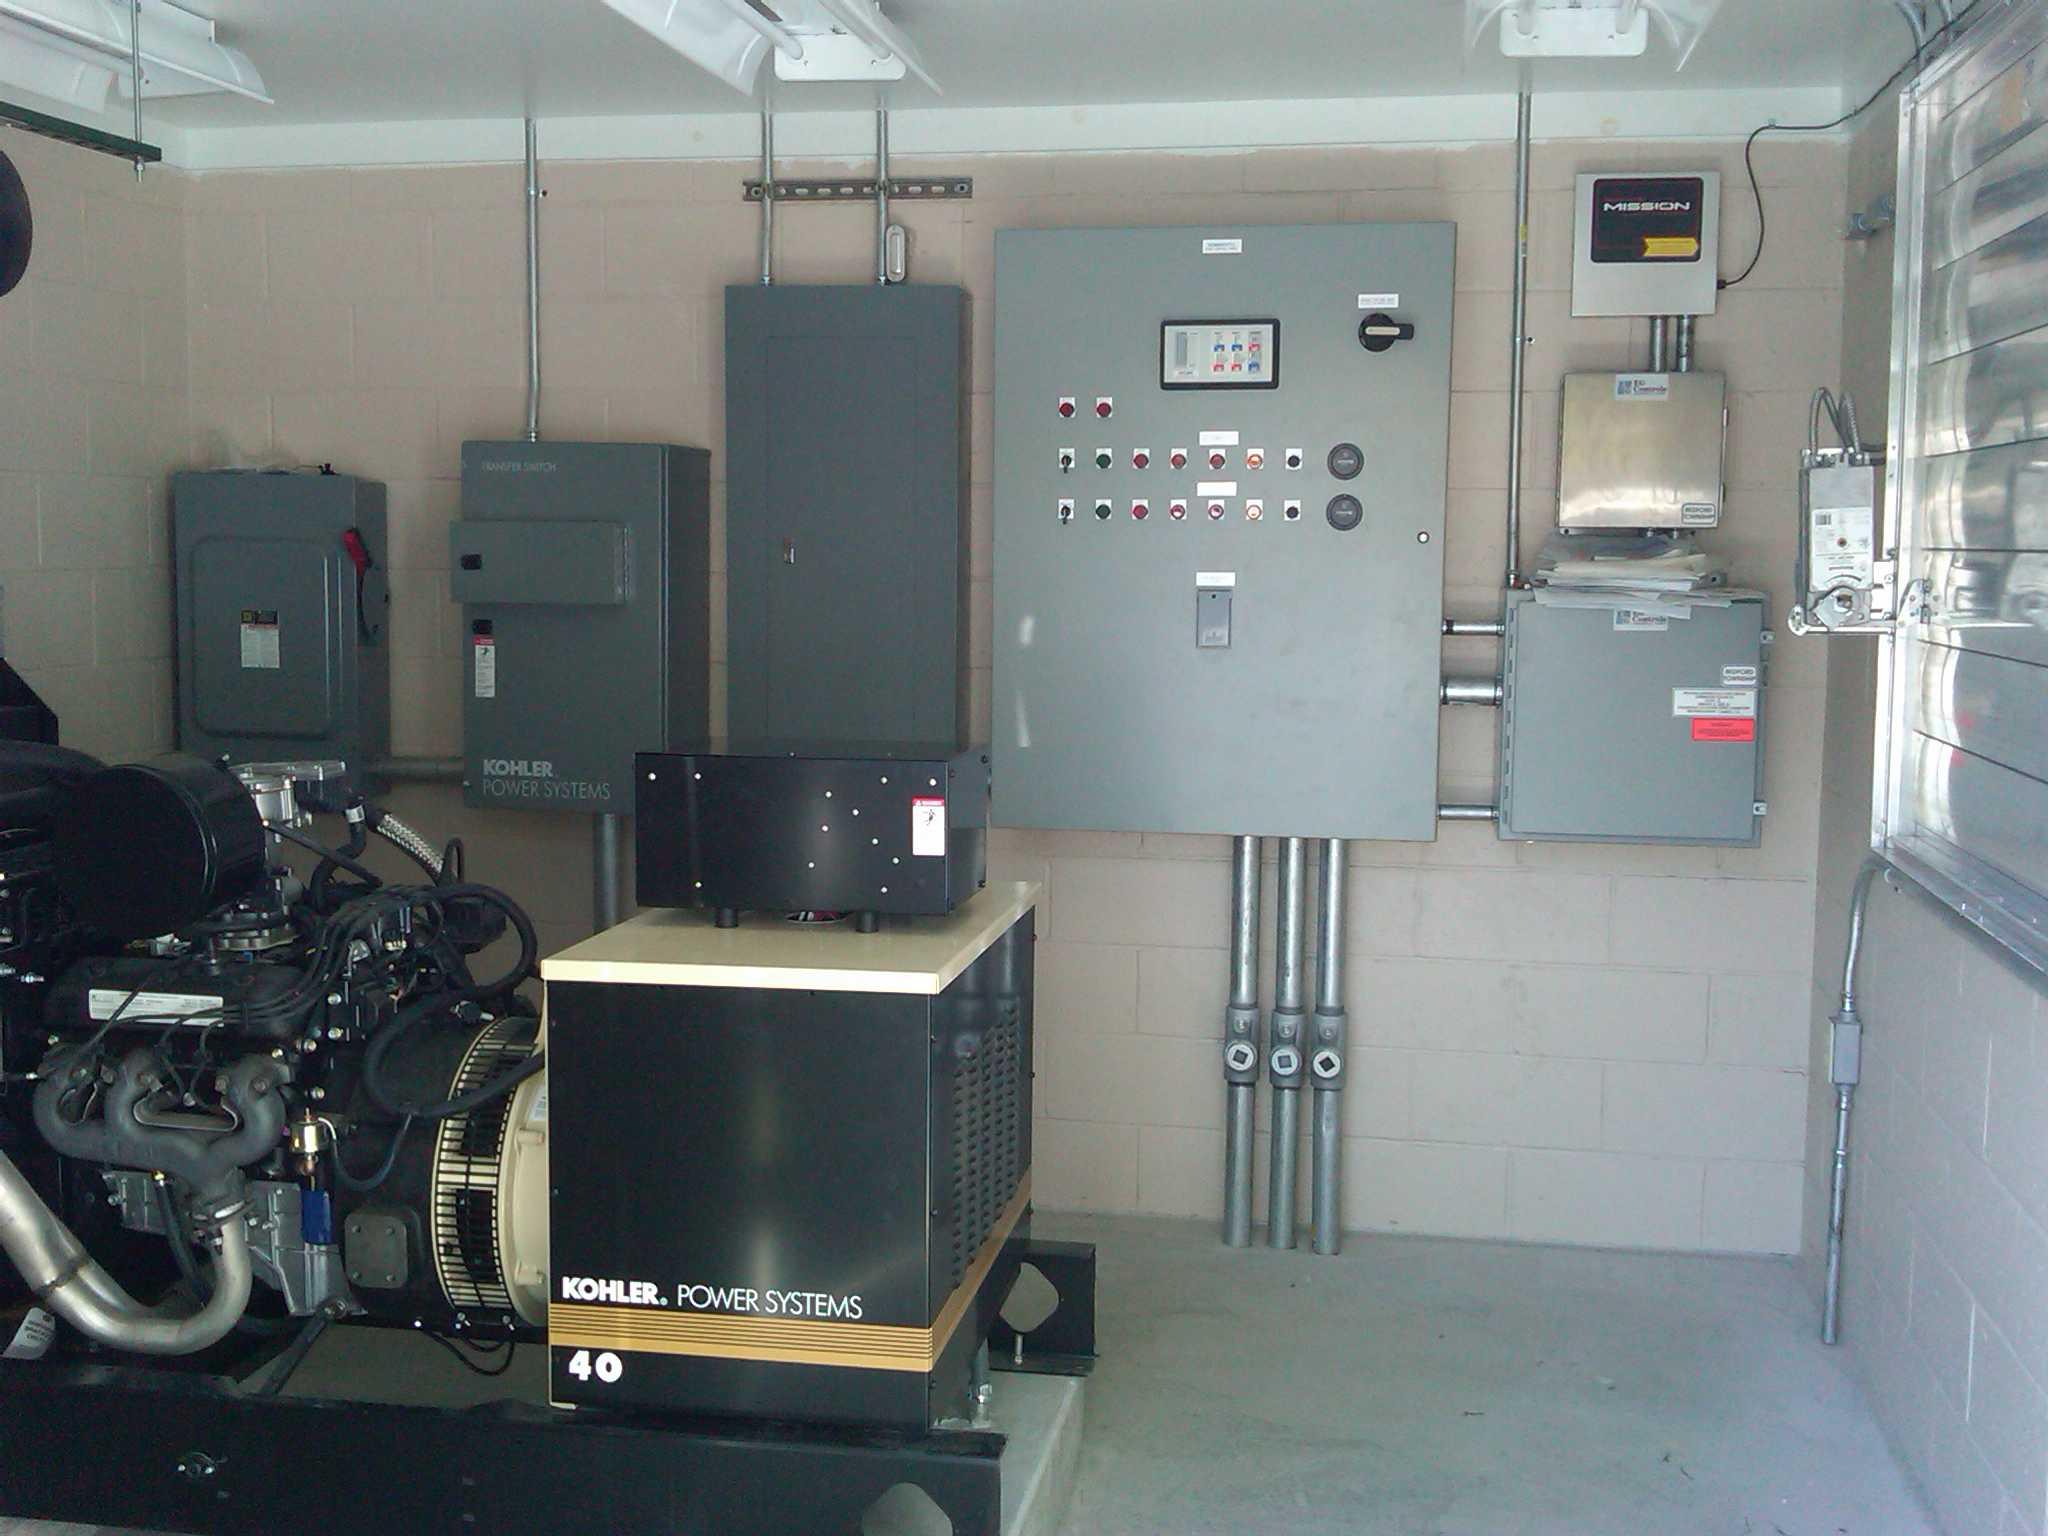 Enclosed pump station